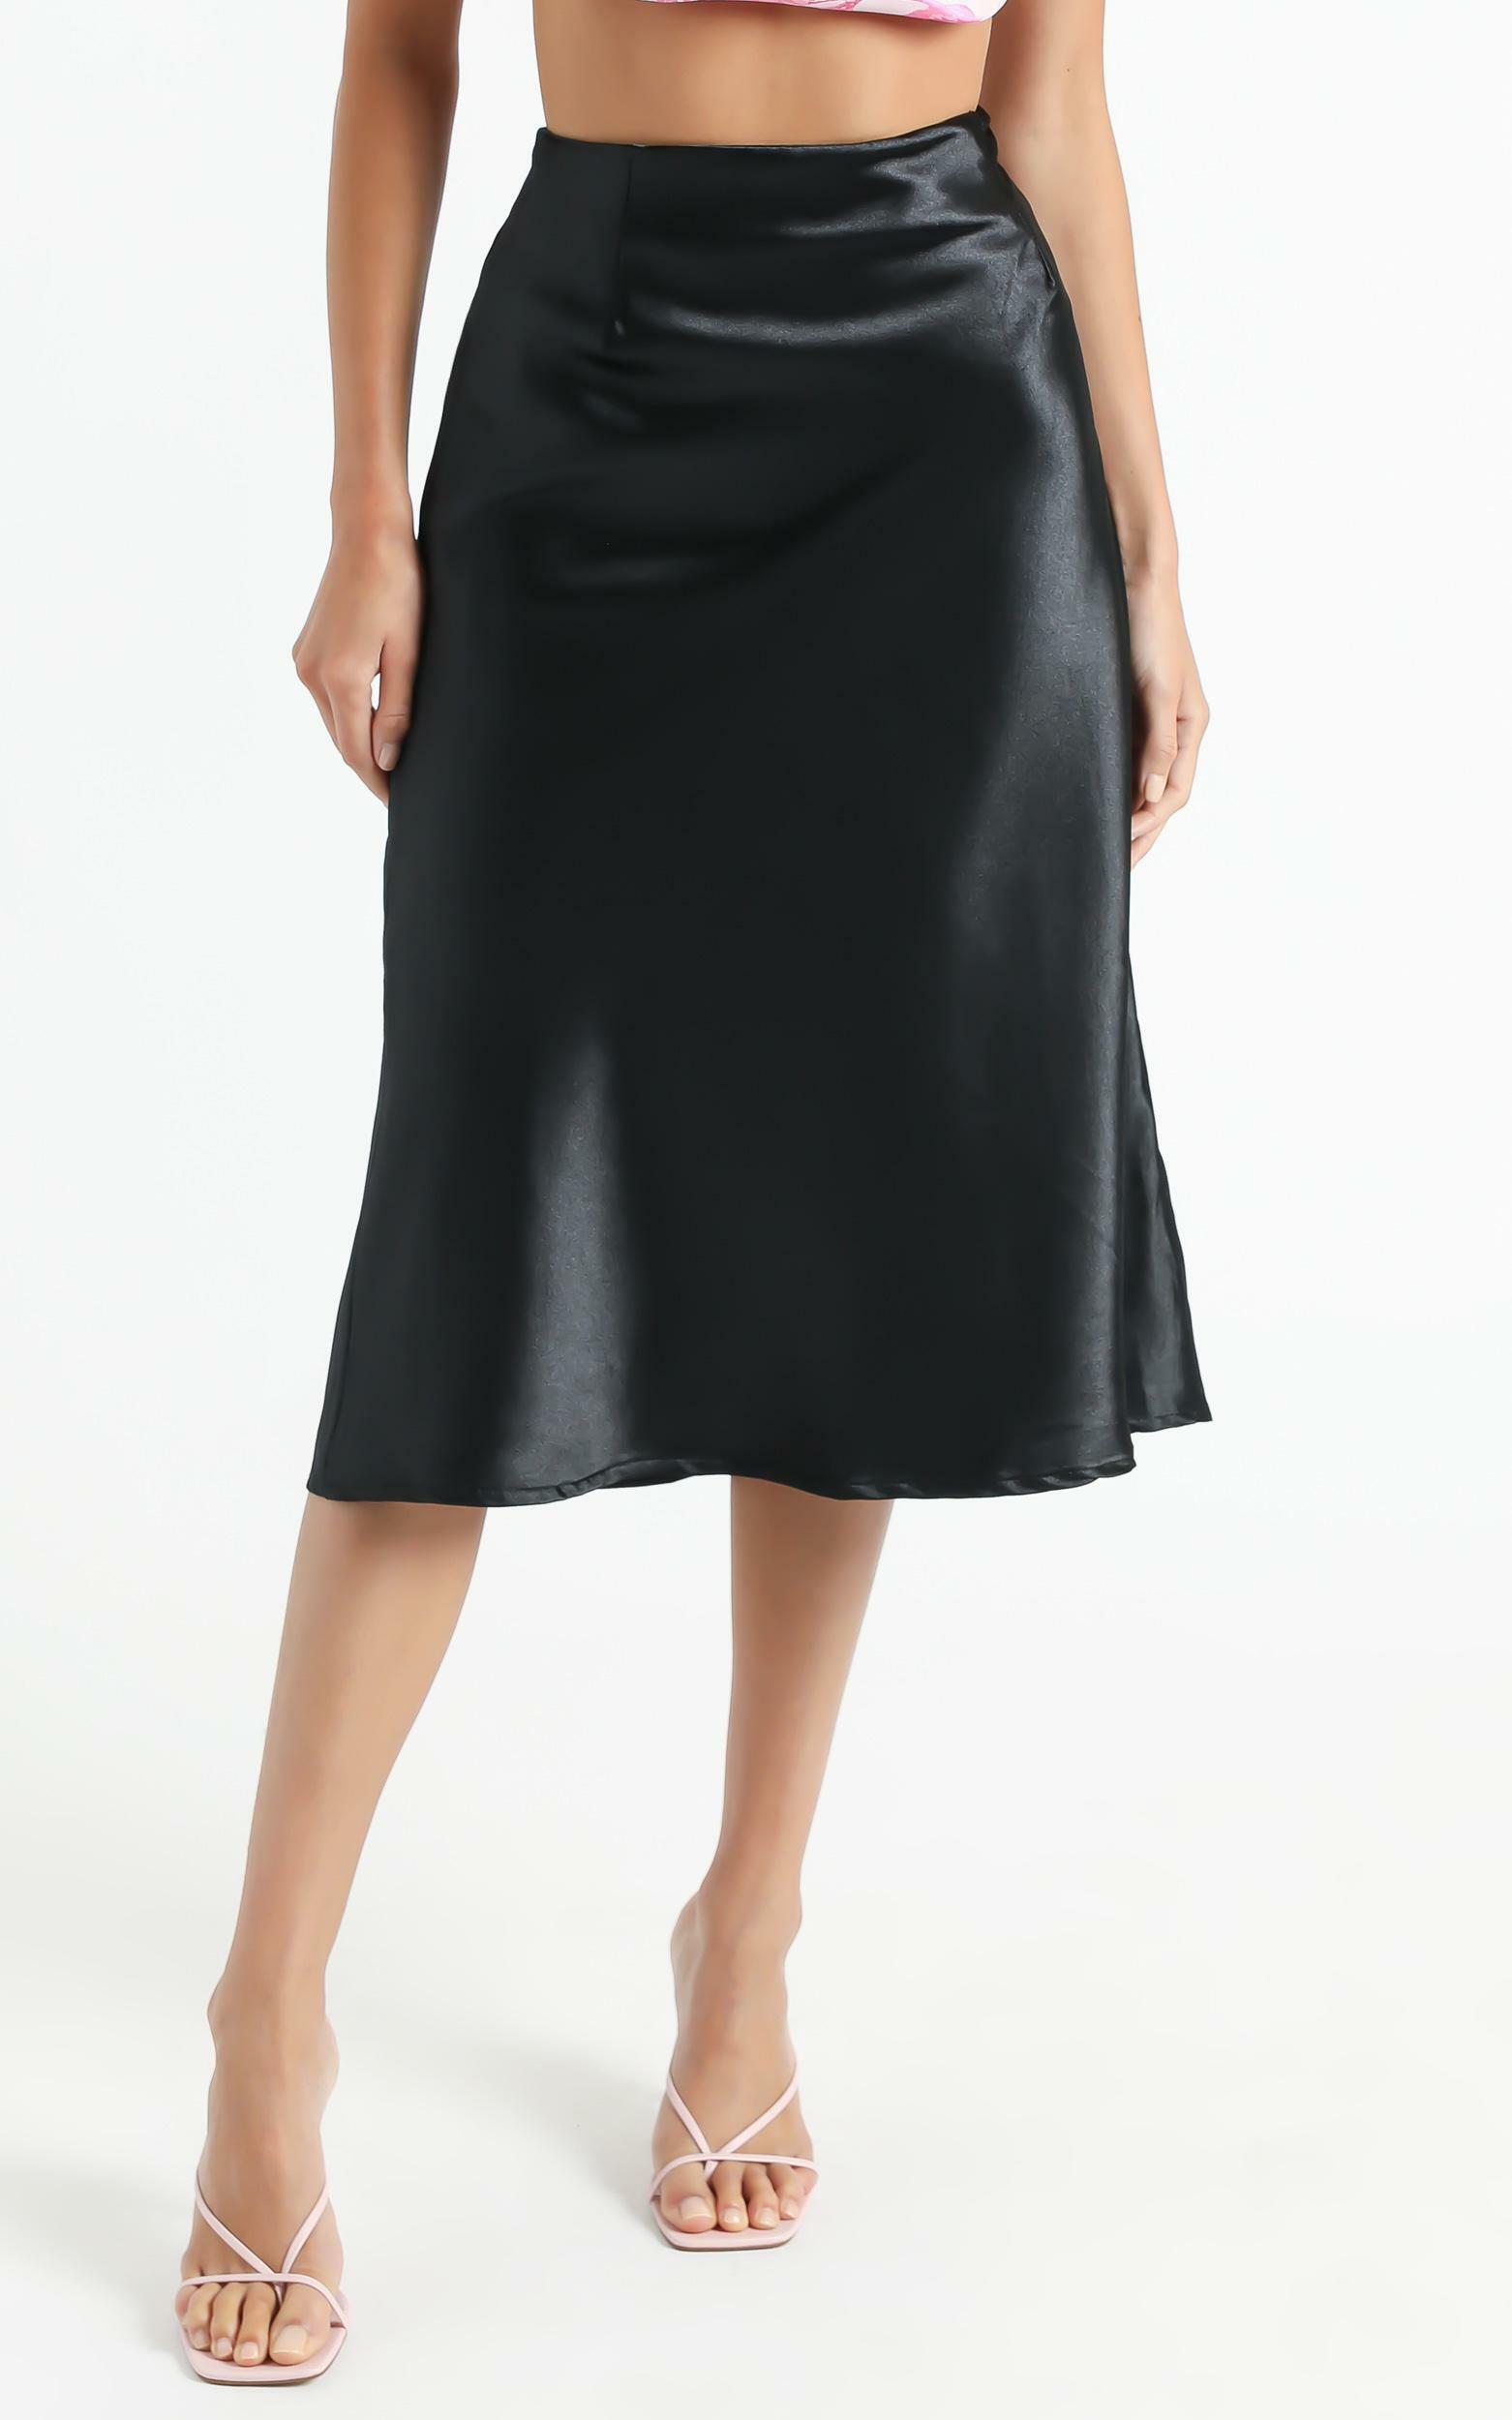 Creating Art Skirt in Black - 06, BLK1, hi-res image number null